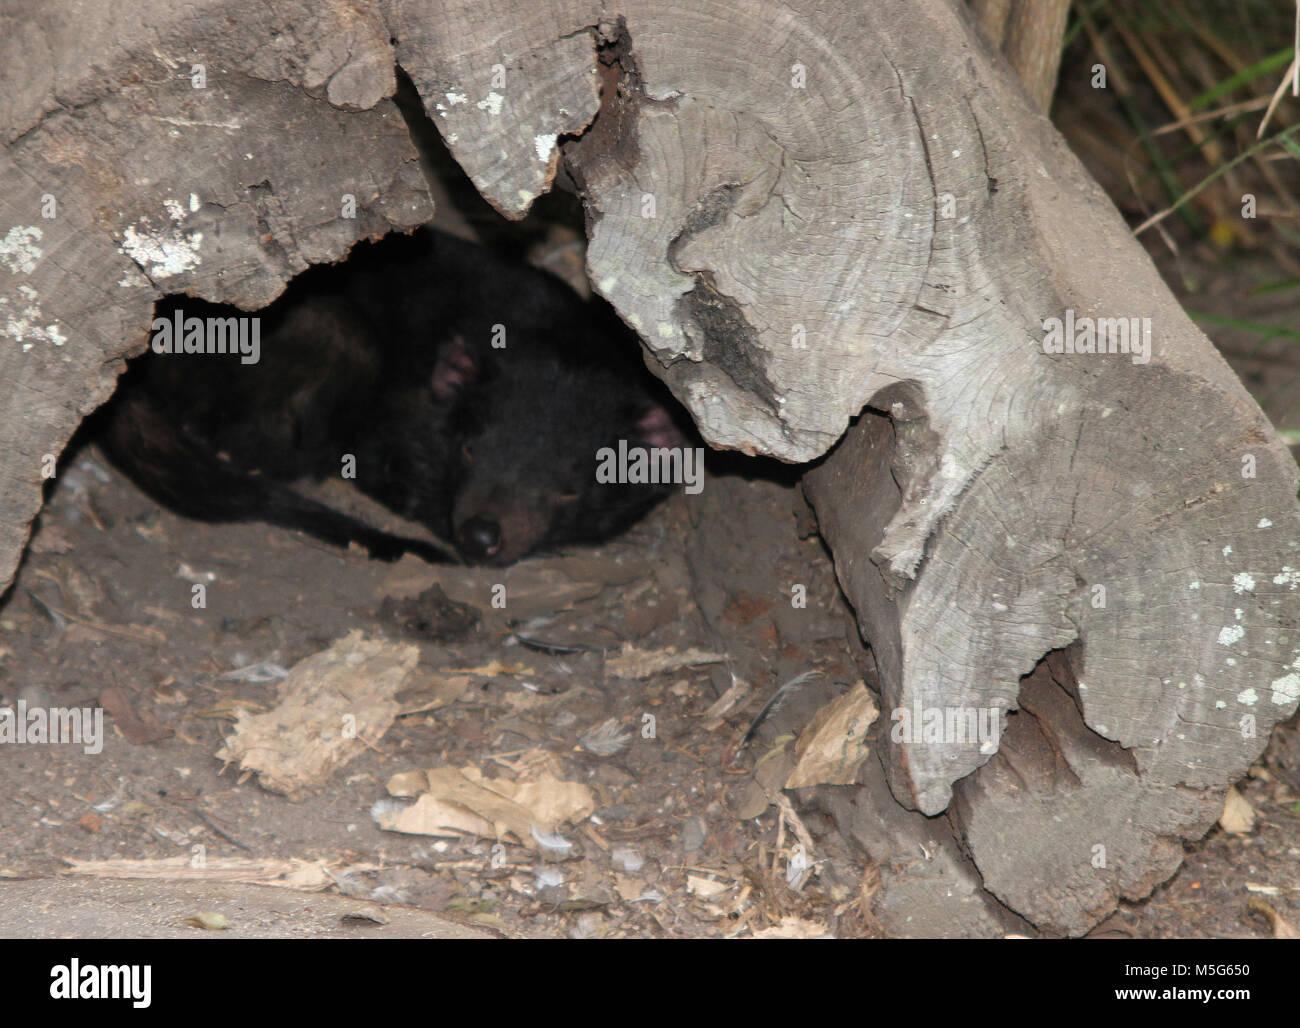 Tasmanian devil, Sarcophilus harrisii,  Lone Pine Koala Sanctuary, Brisbane, Australia Stock Photo